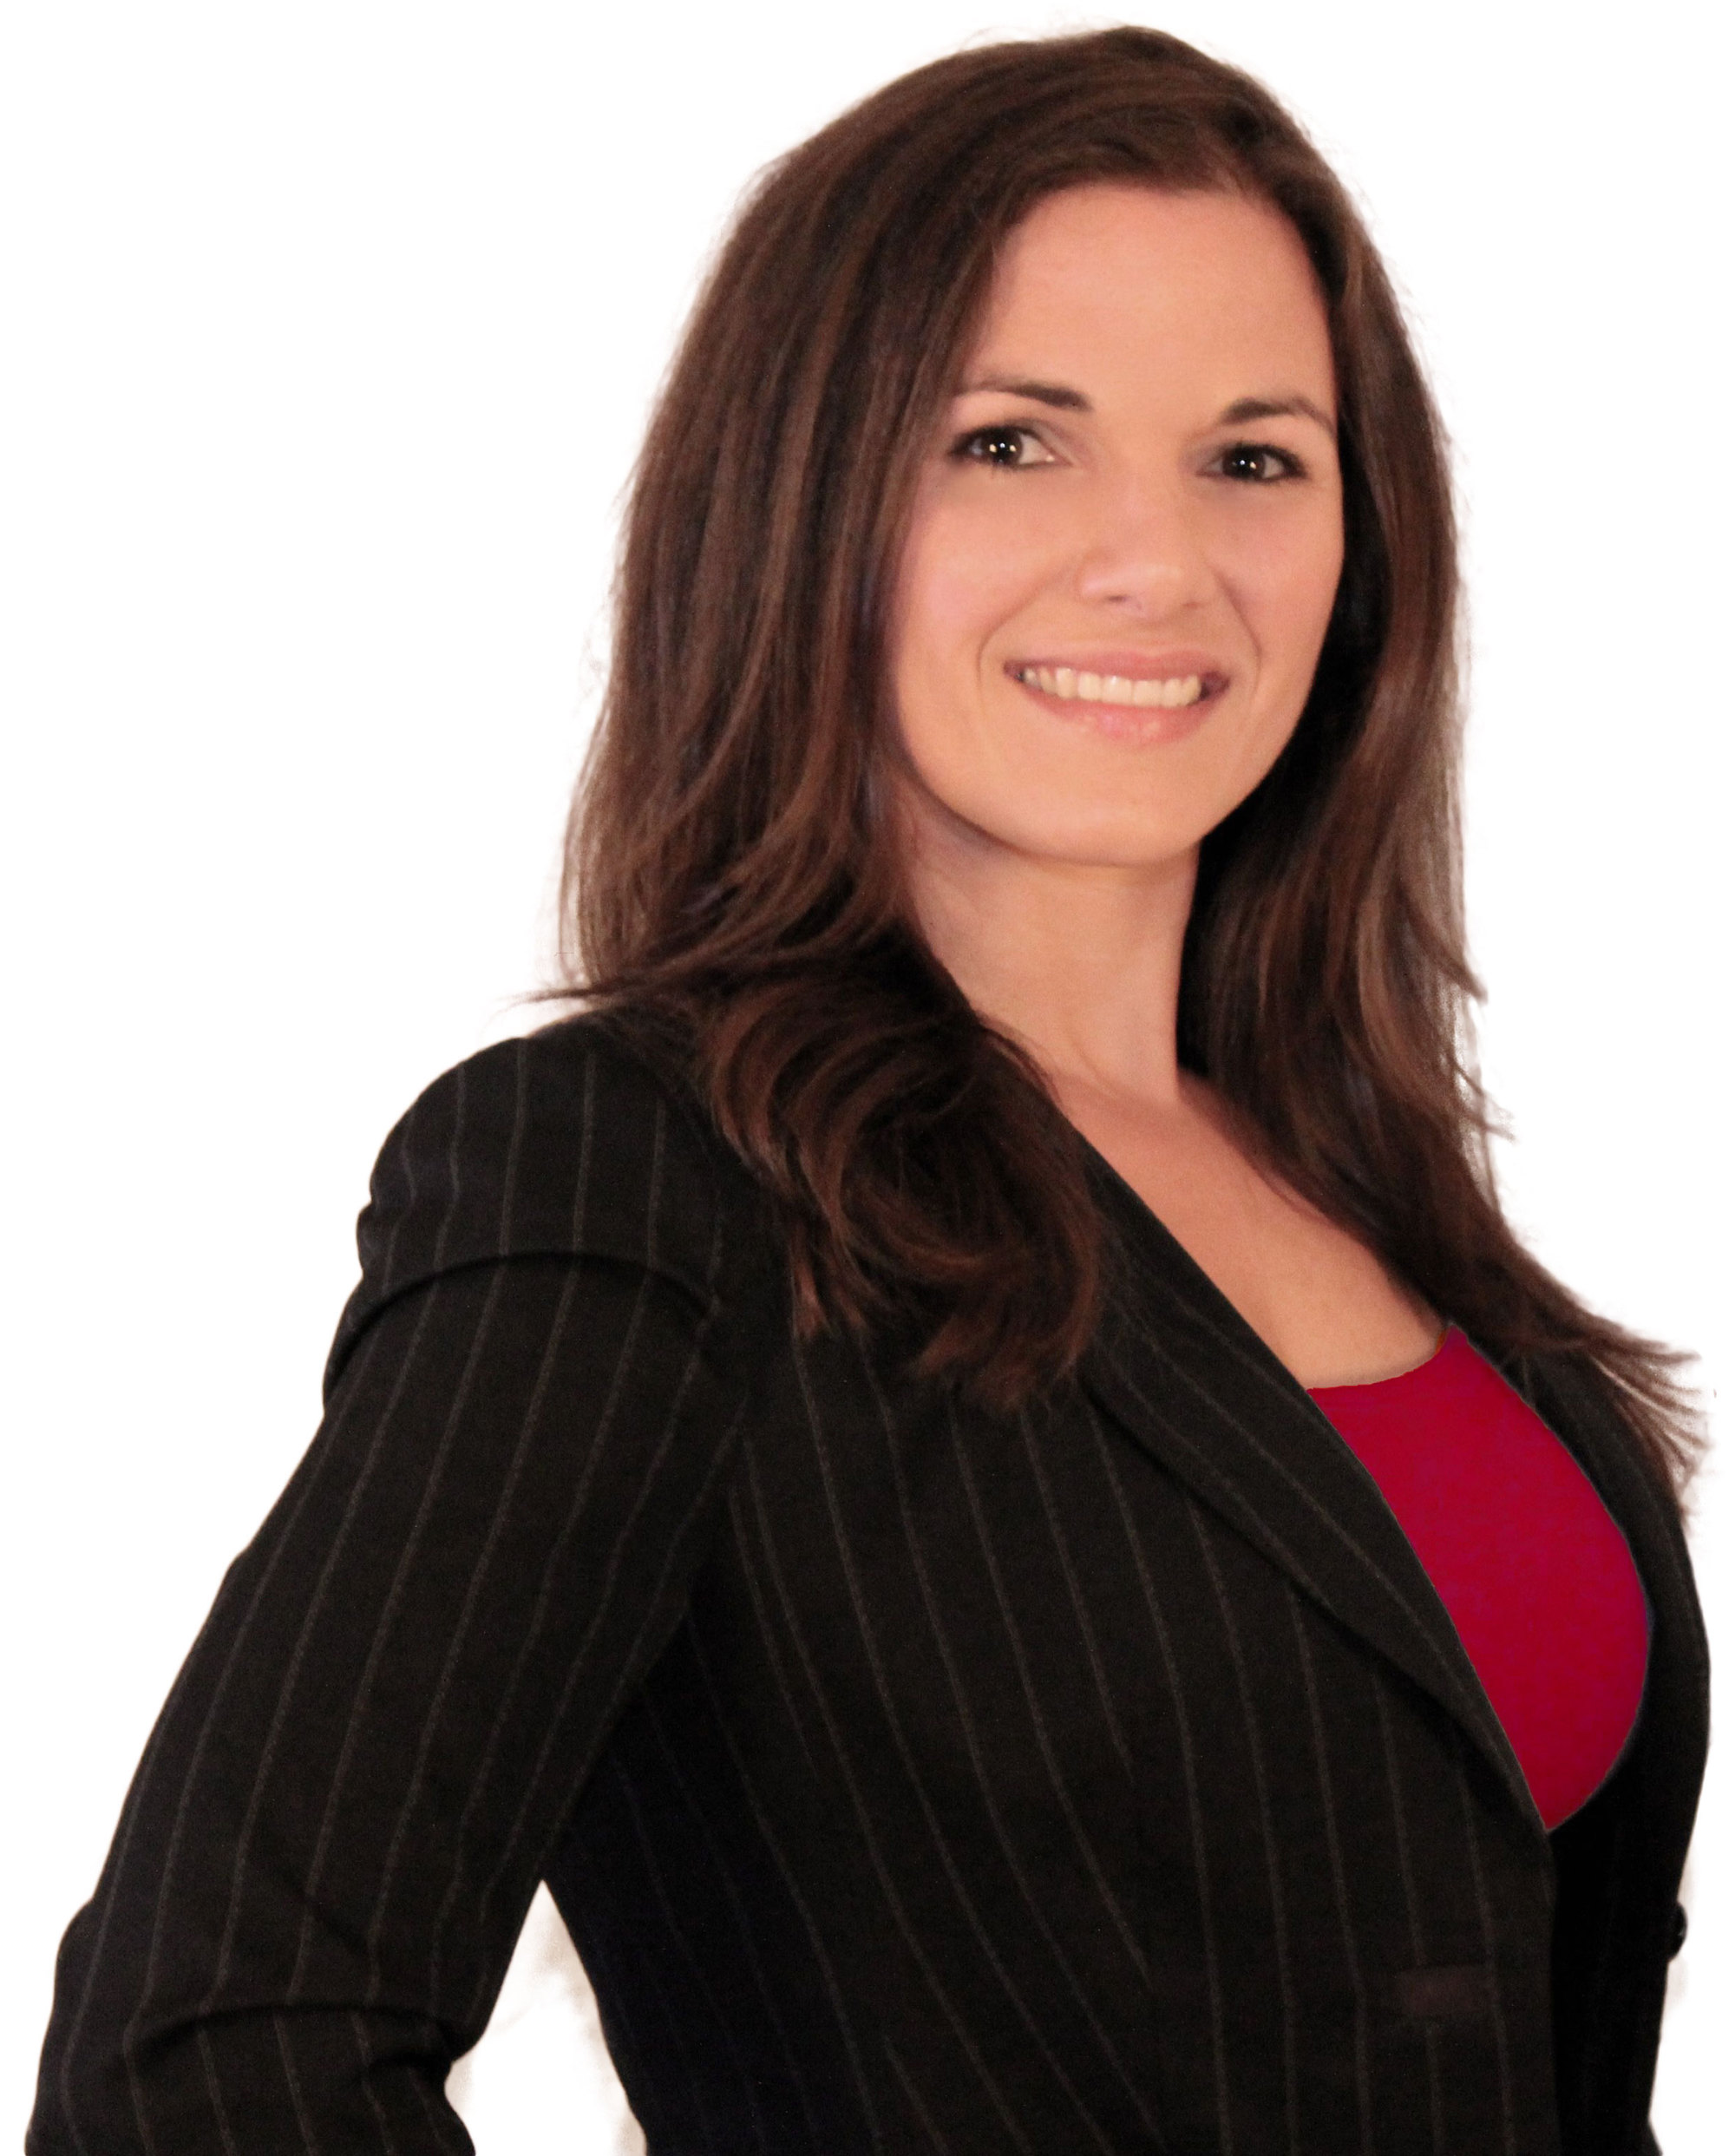 Melissa Syverson